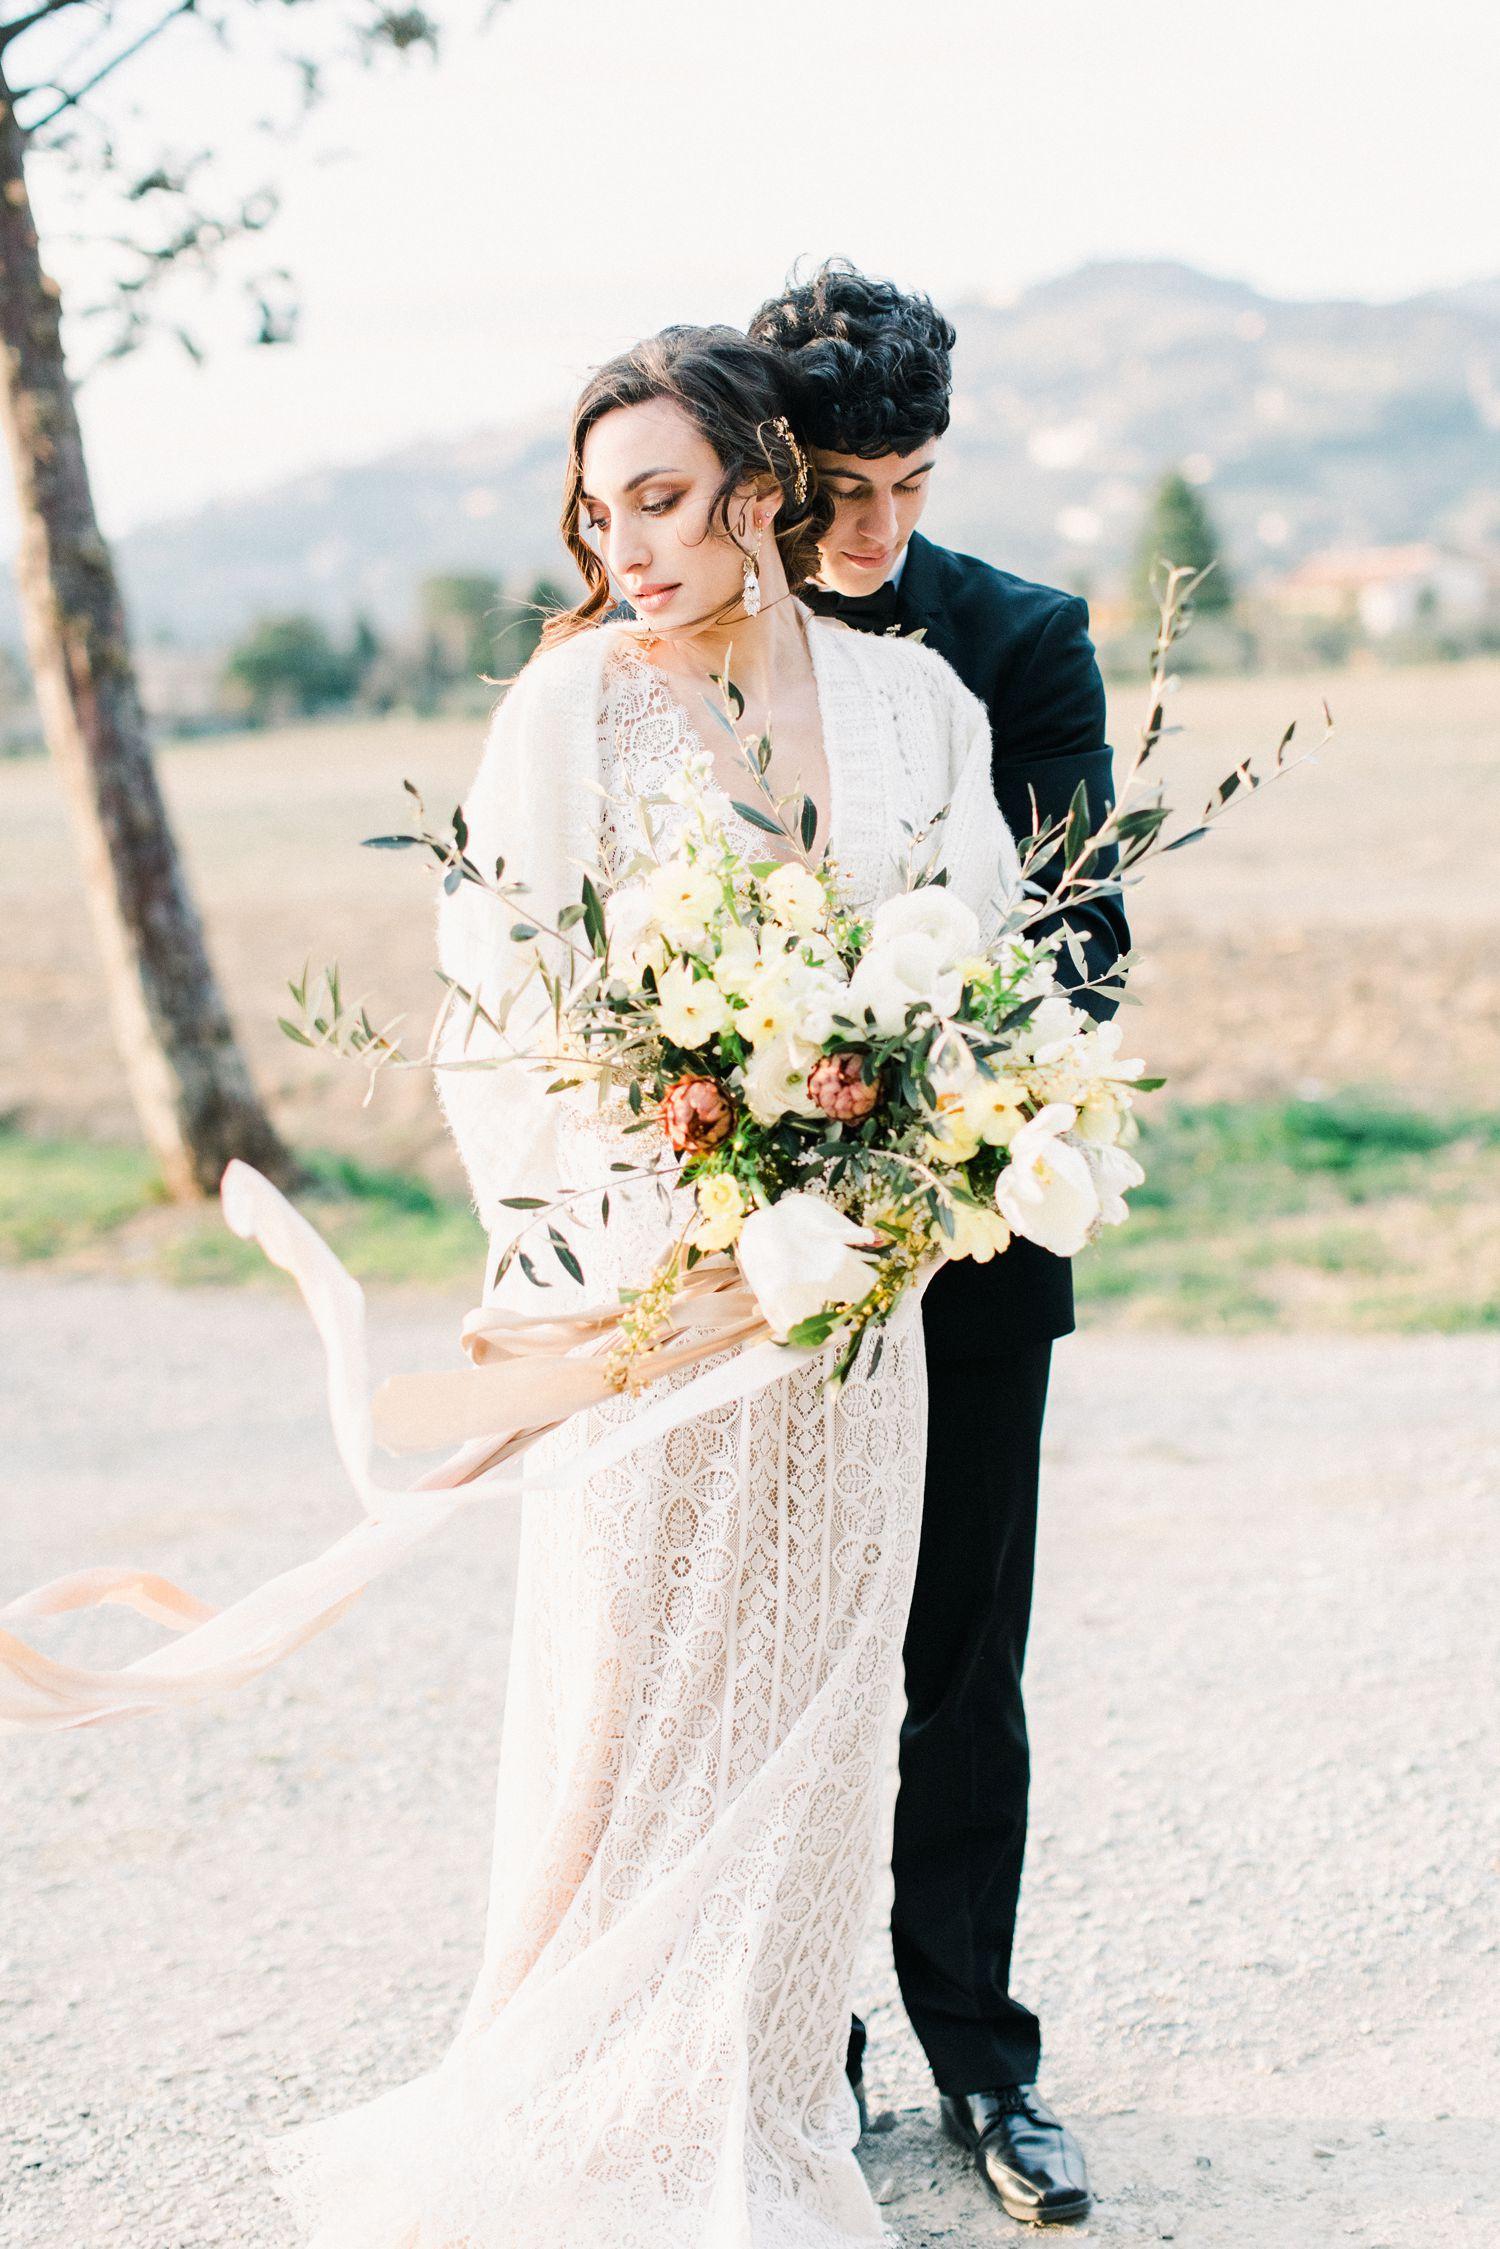 Ewigmein-Fine-Art-Wedding-photography-Tuscany-Villa-Ivana-Hochzeitsfotograf-Toskana-Italien_1411